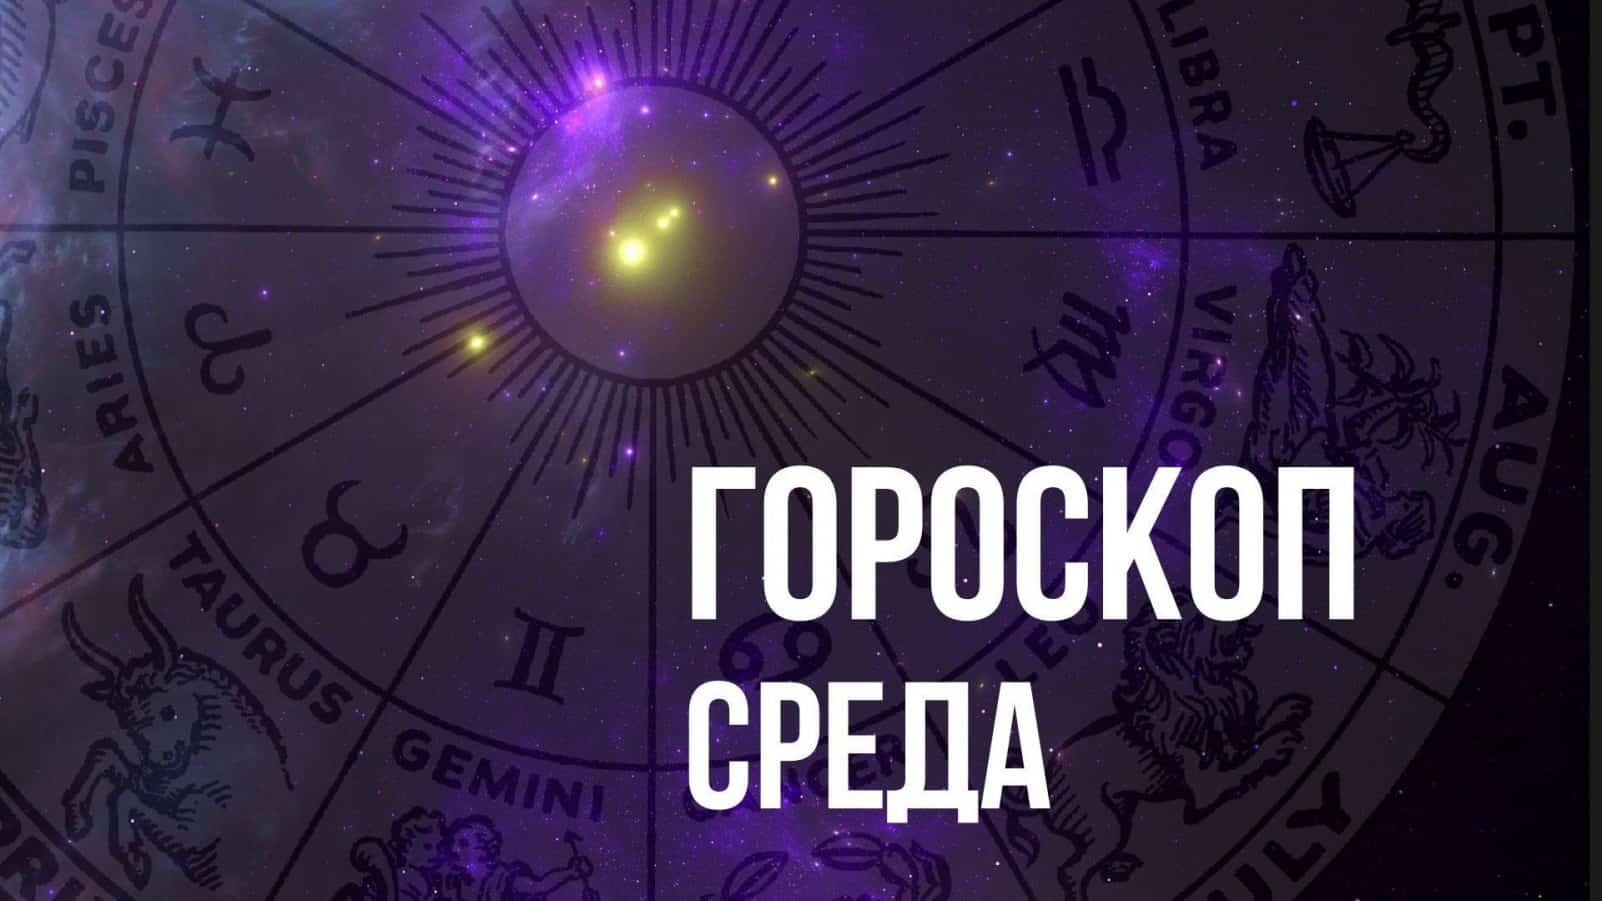 Гороскоп на среду 11 августа для каждого знака Зодиака